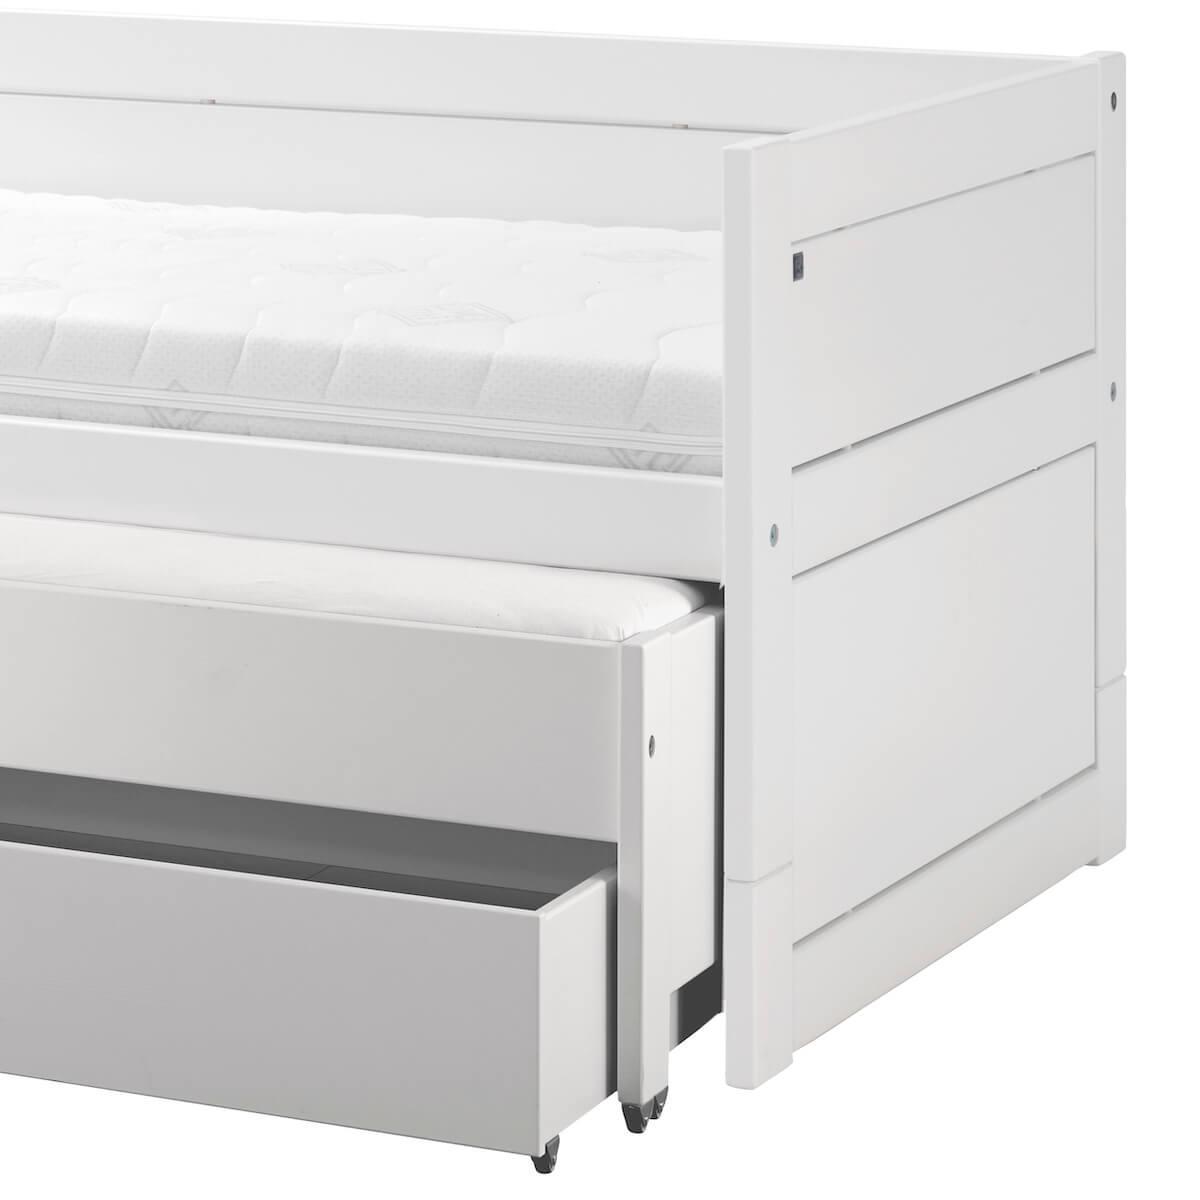 Lit banquette 90x200cm lit gigogne-tiroir Lifetime blanc